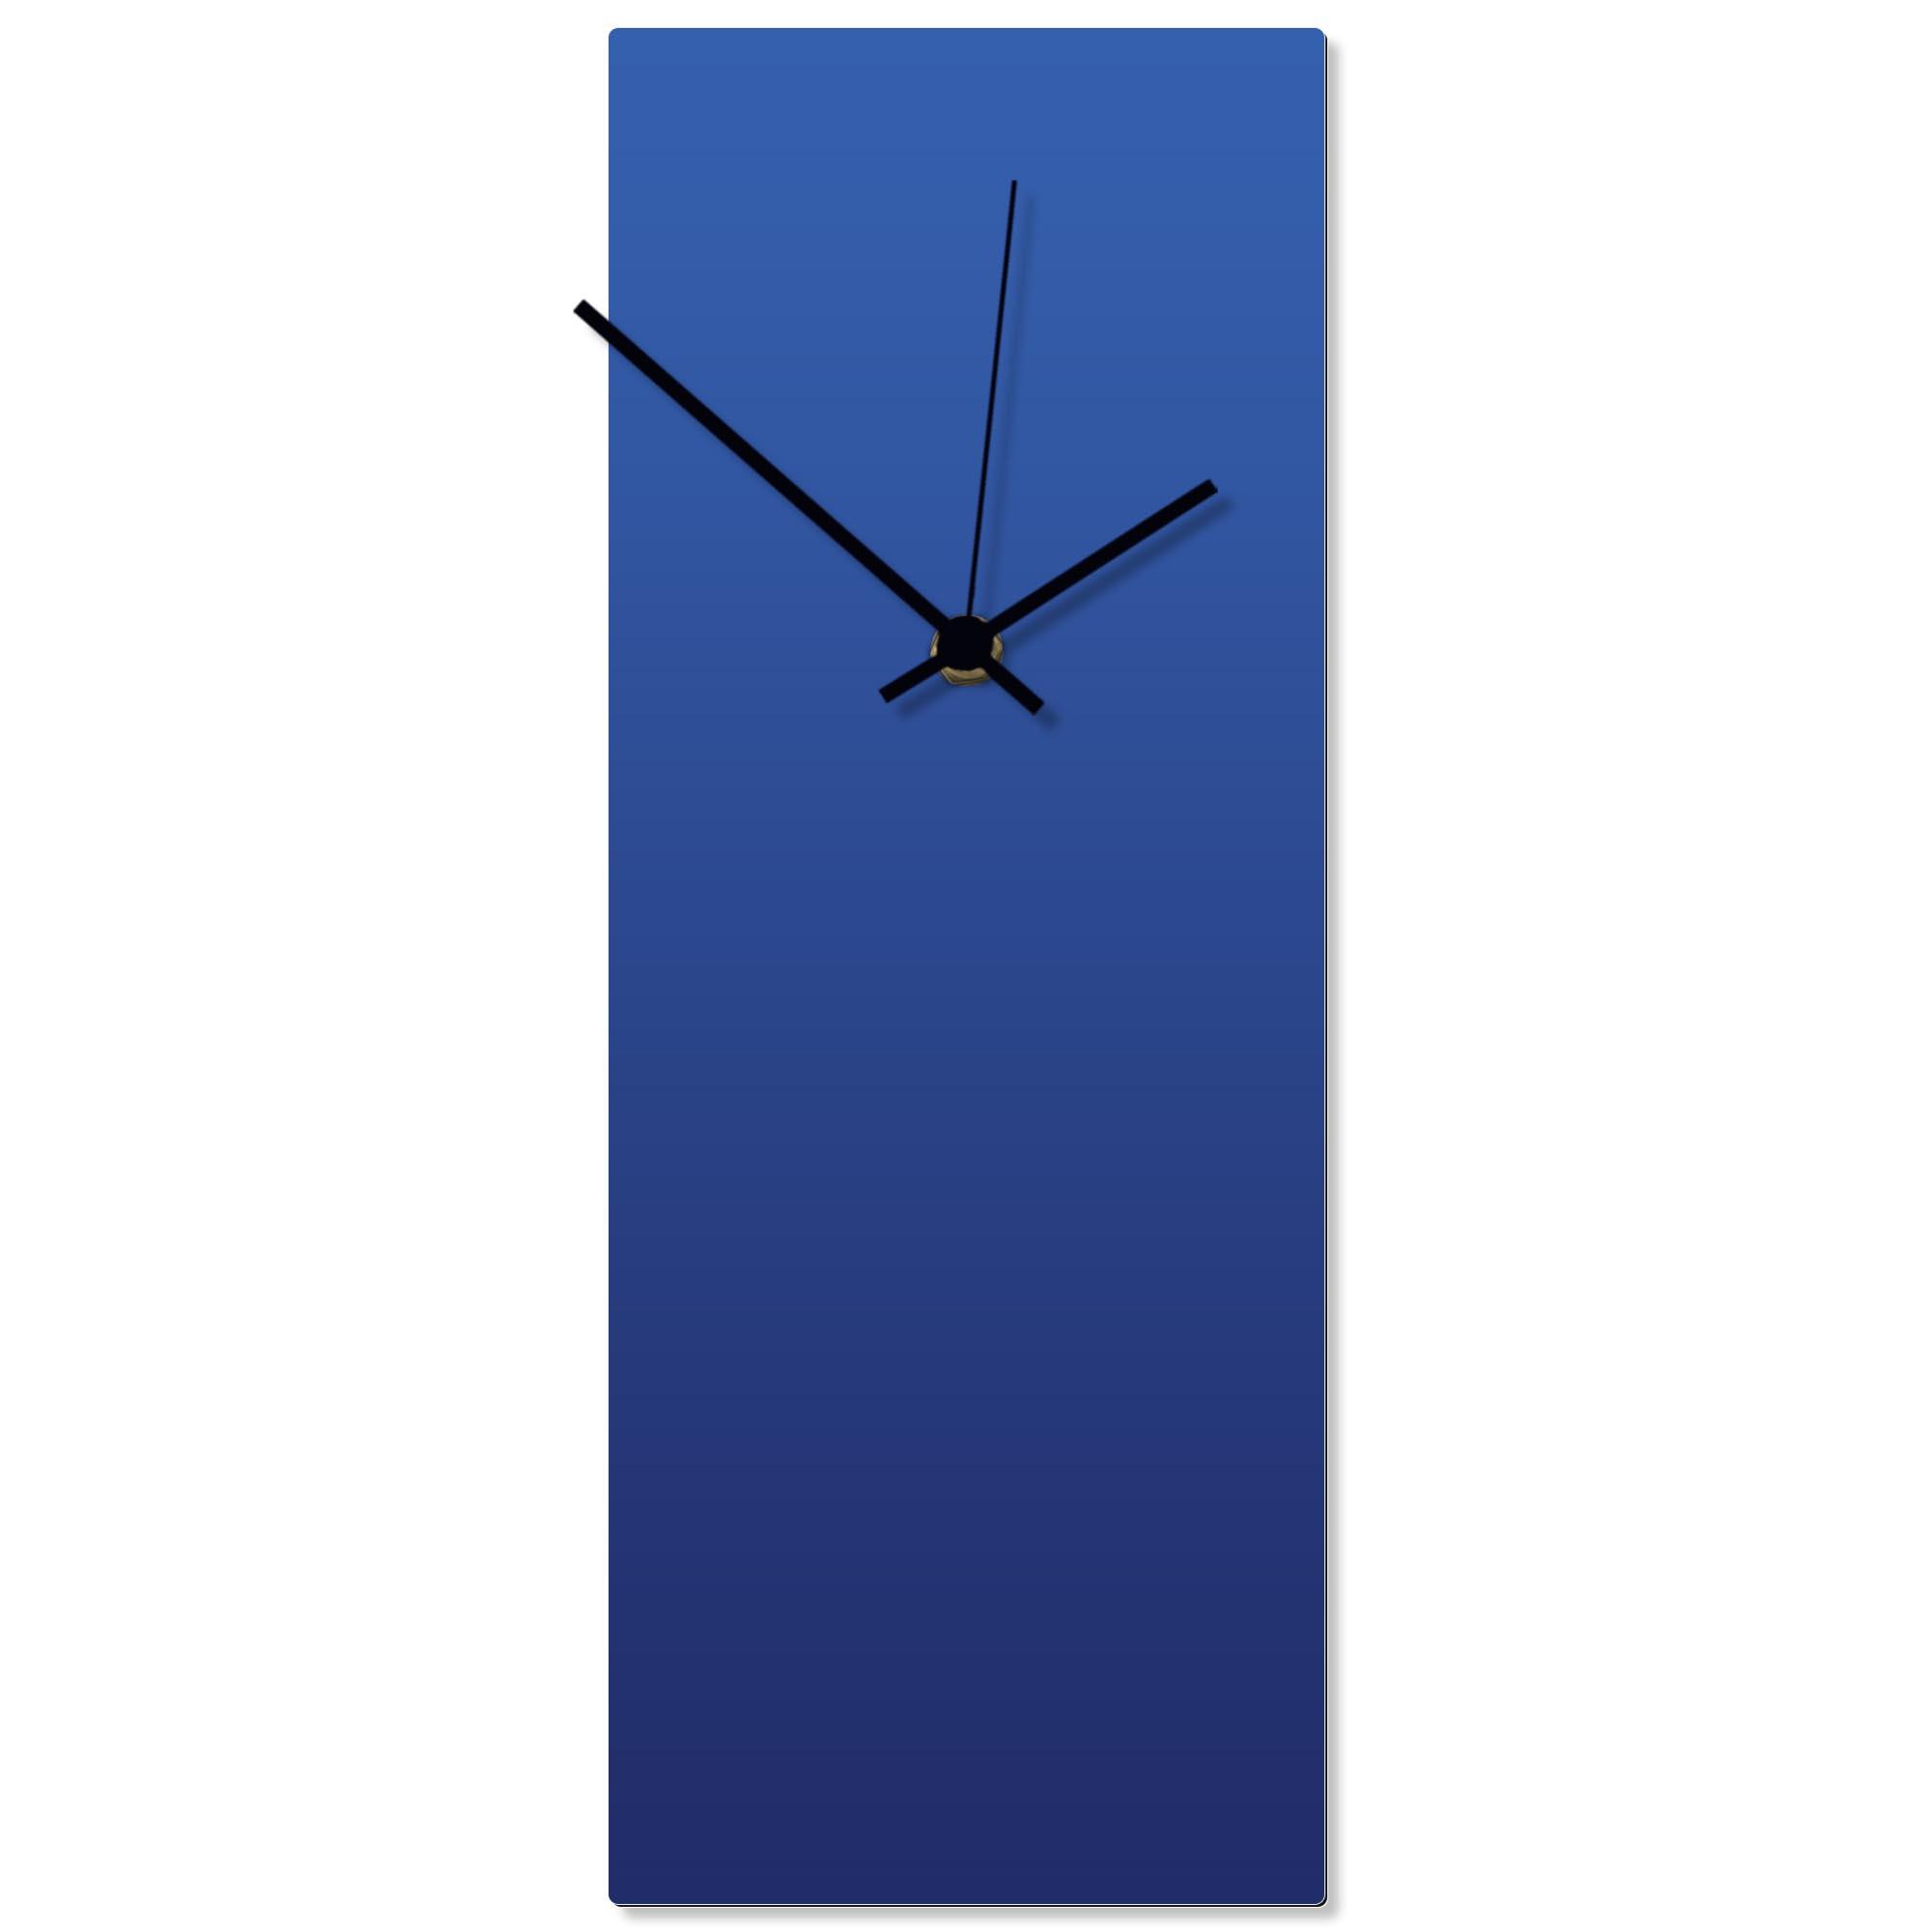 Blueout Black Clock 6x16in. Aluminum Polymetal